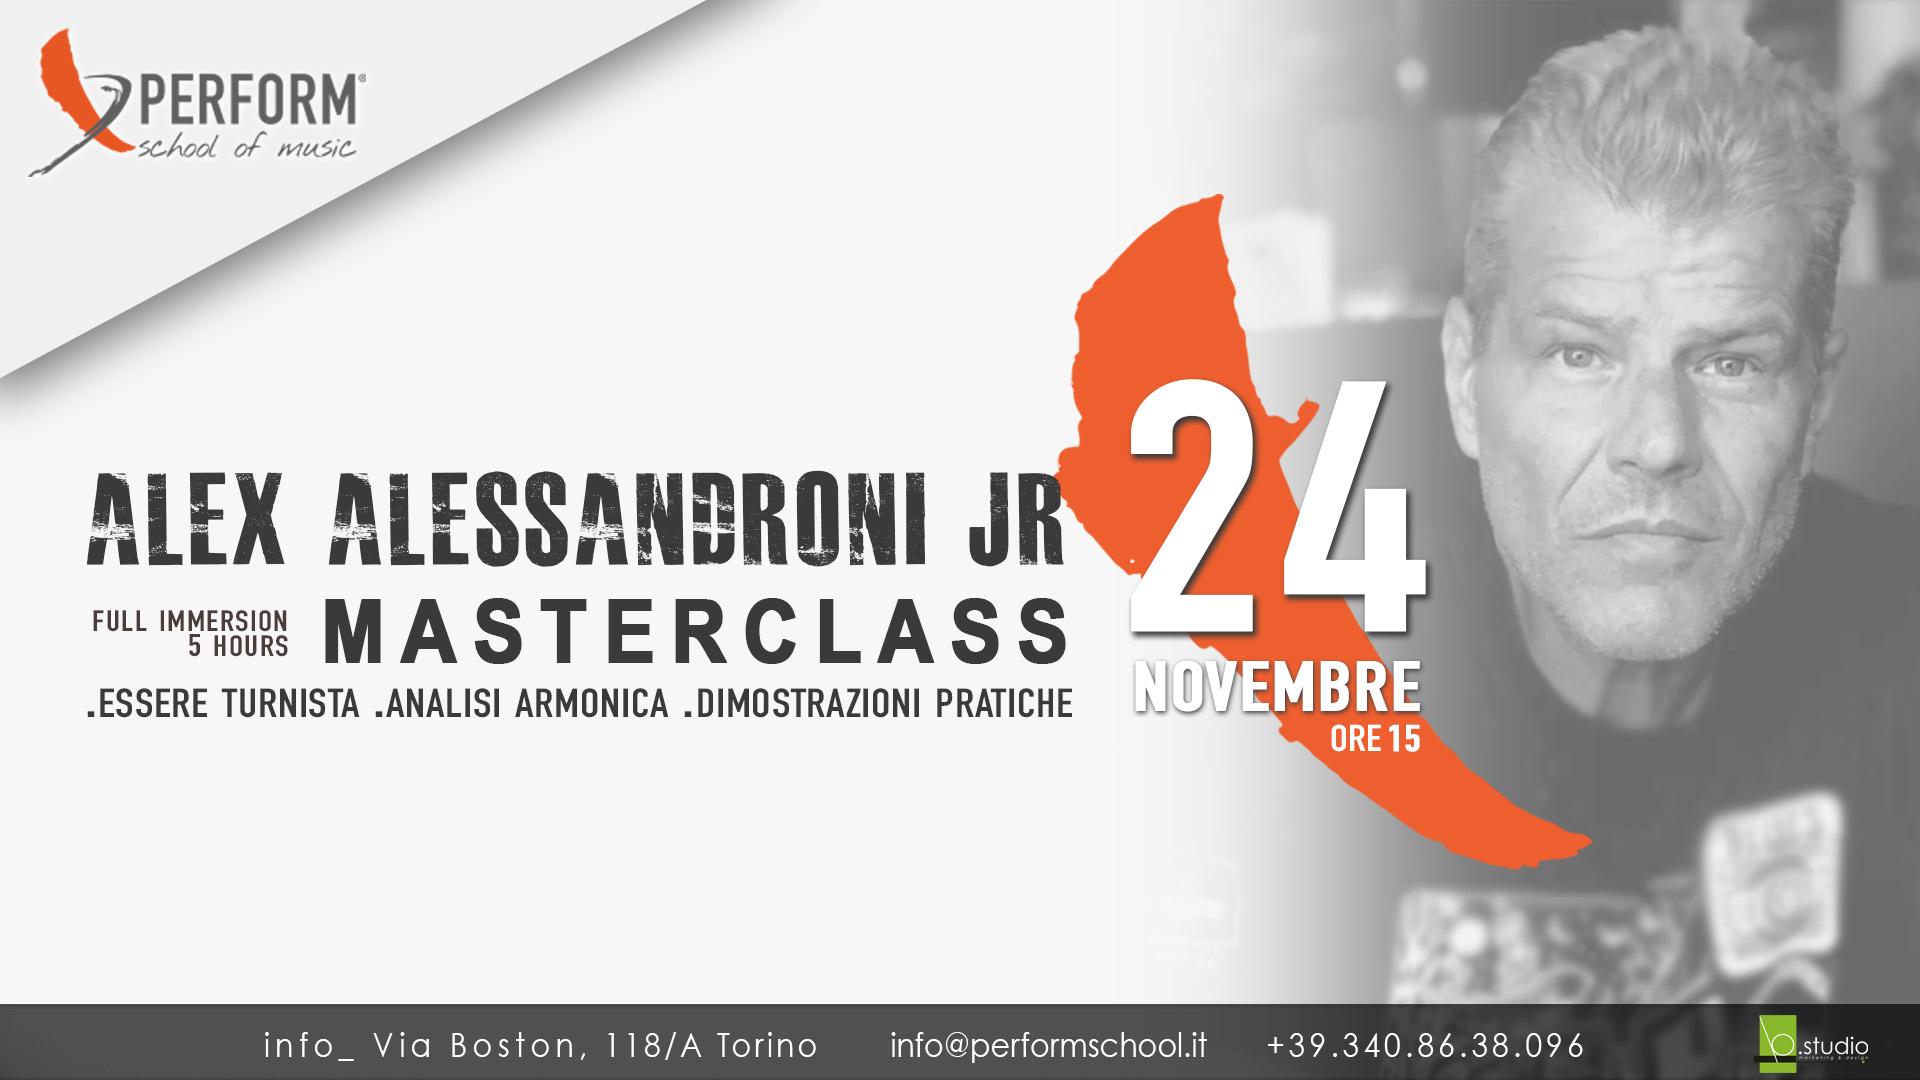 Masterclass Alex Alessandroni Jr